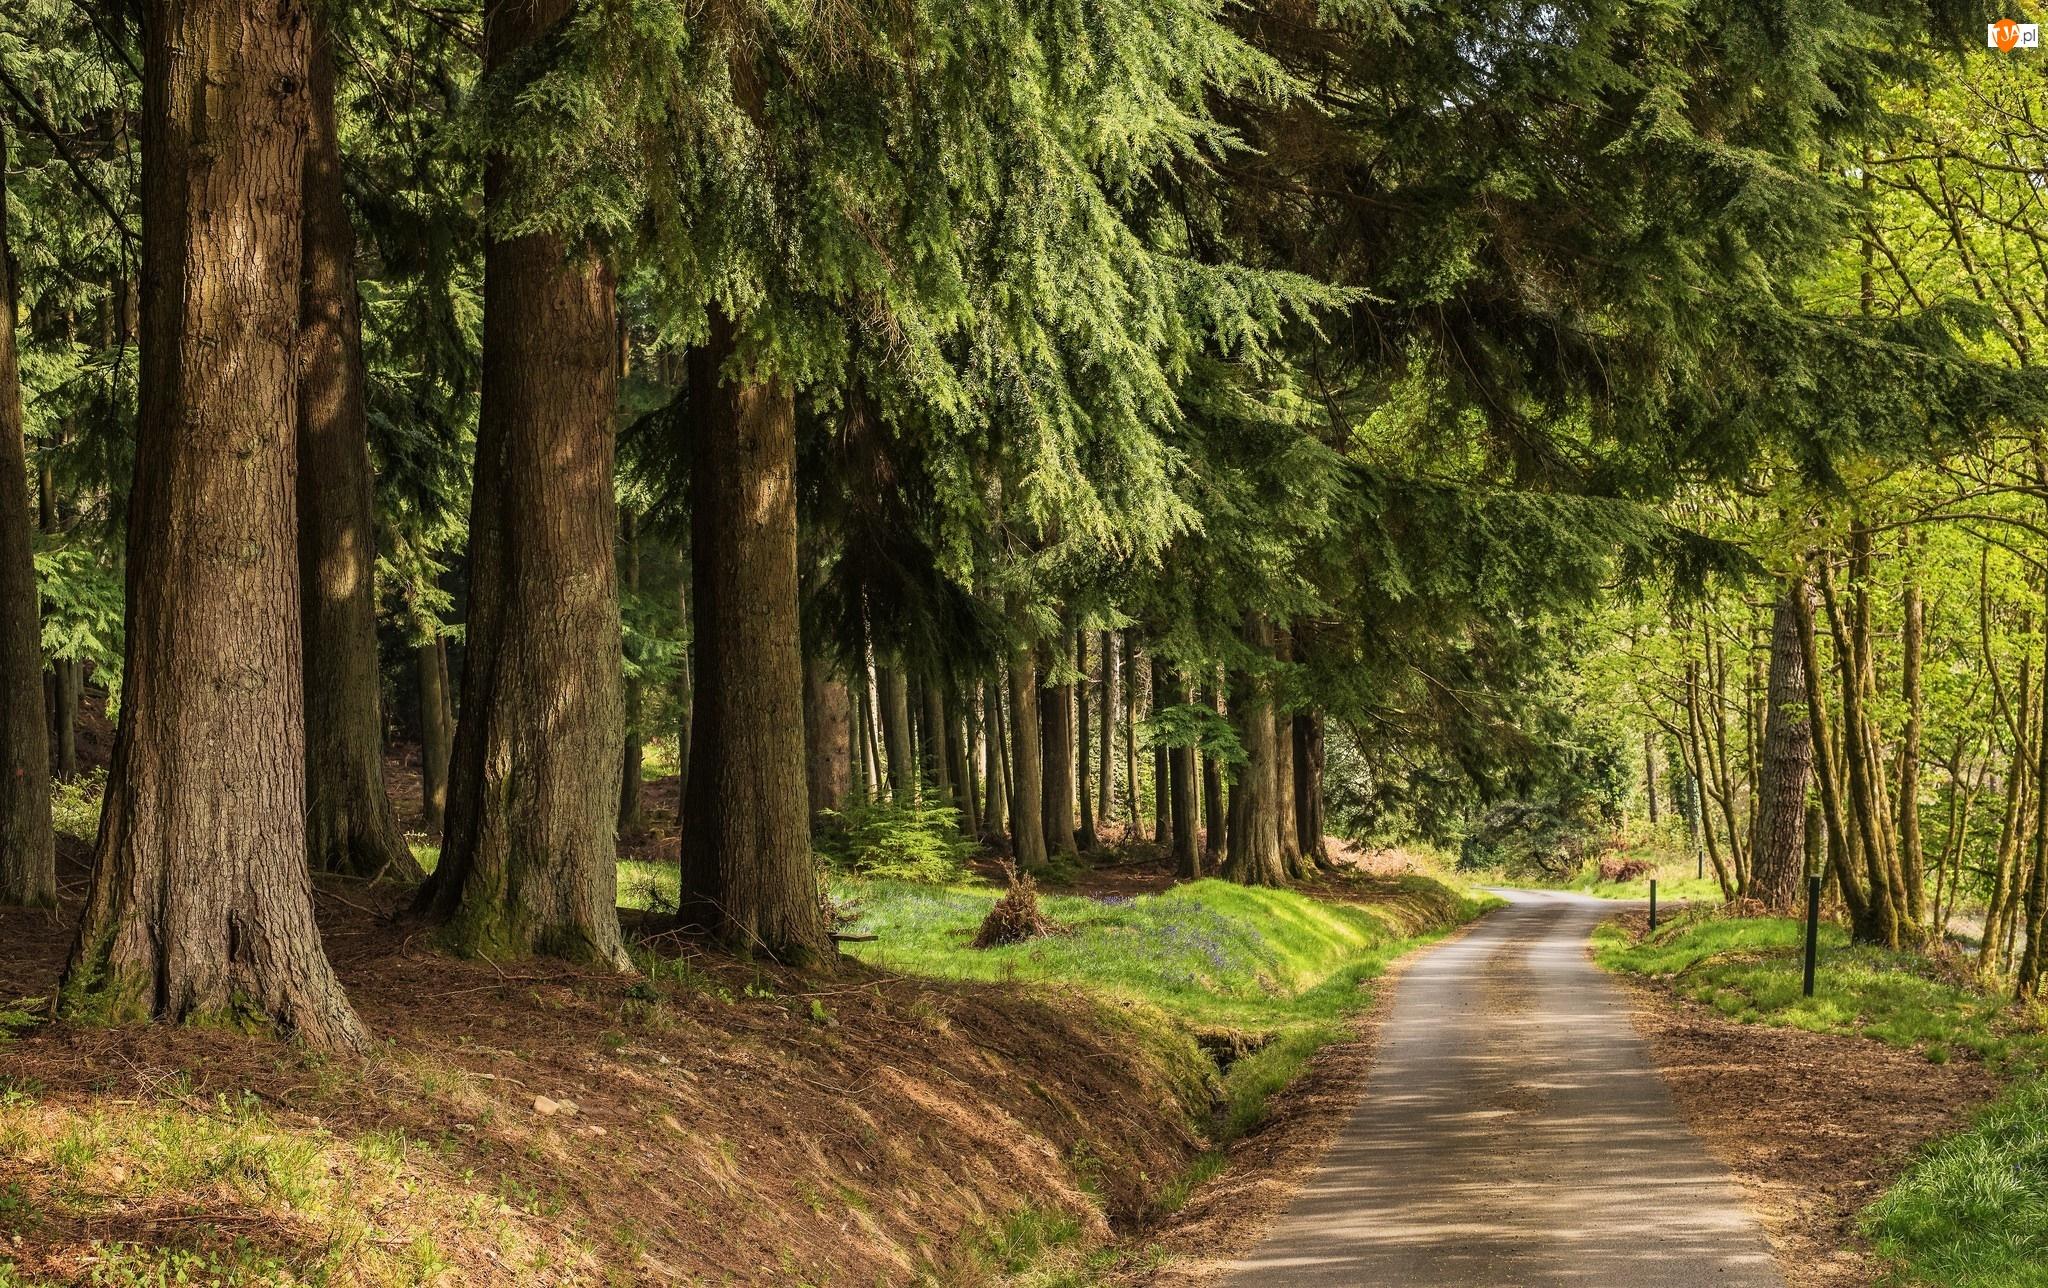 Droga, Las, Drzewa iglaste